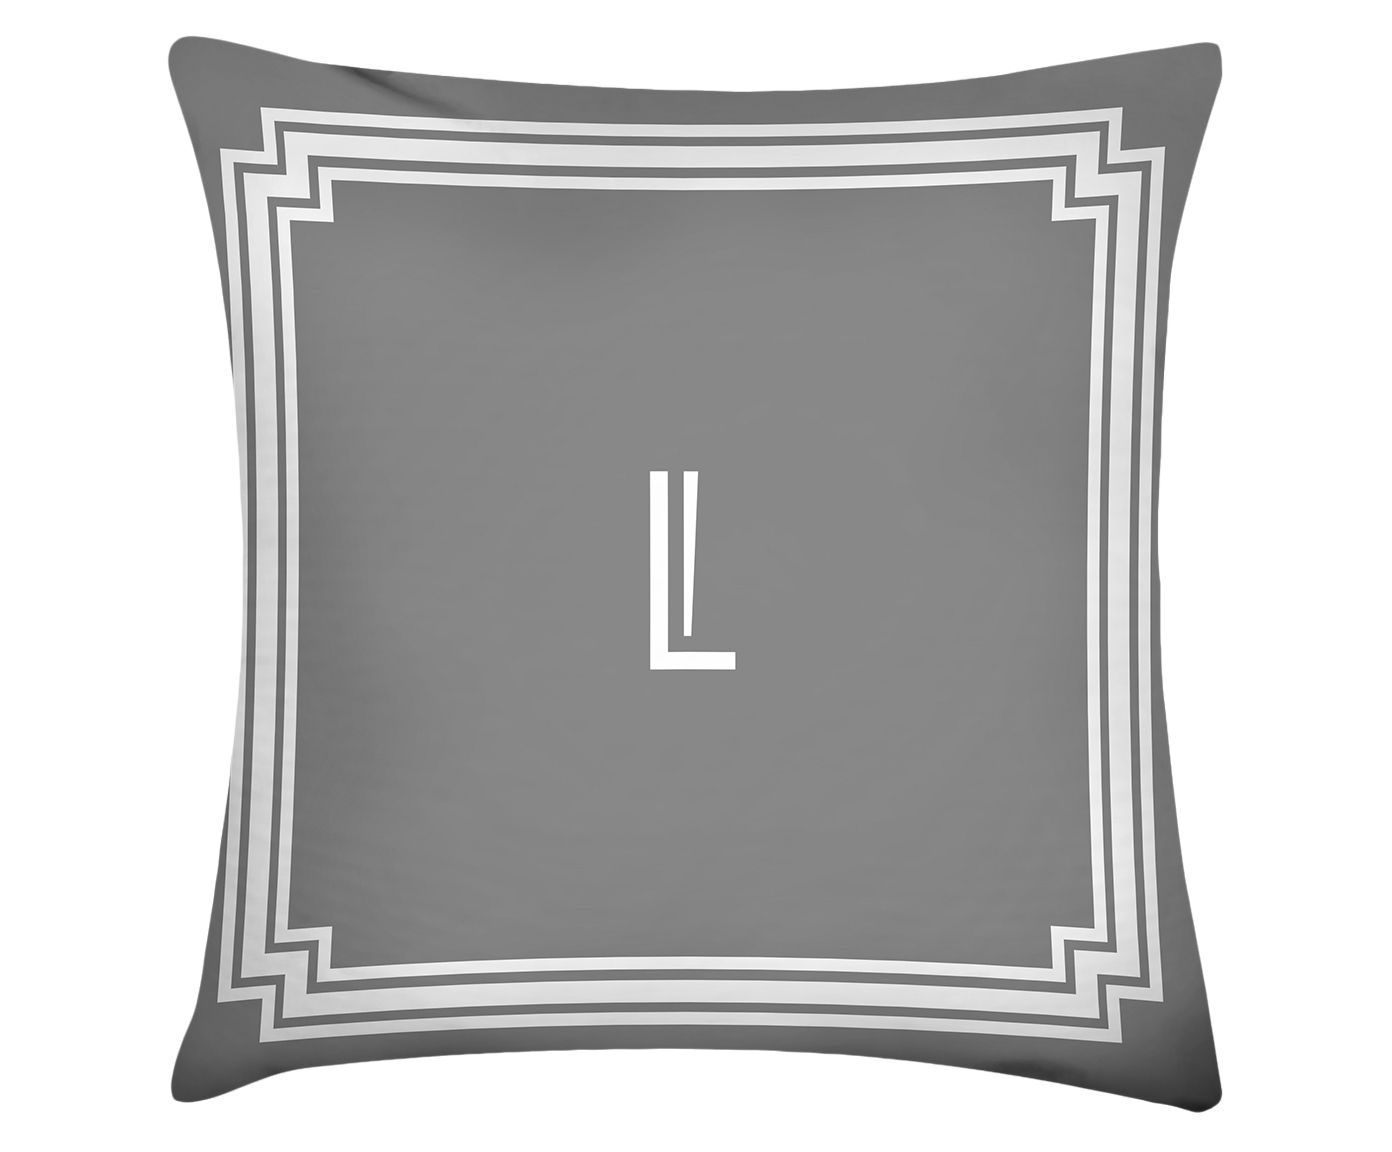 Almofada Letter L - 45x45cm | Westwing.com.br